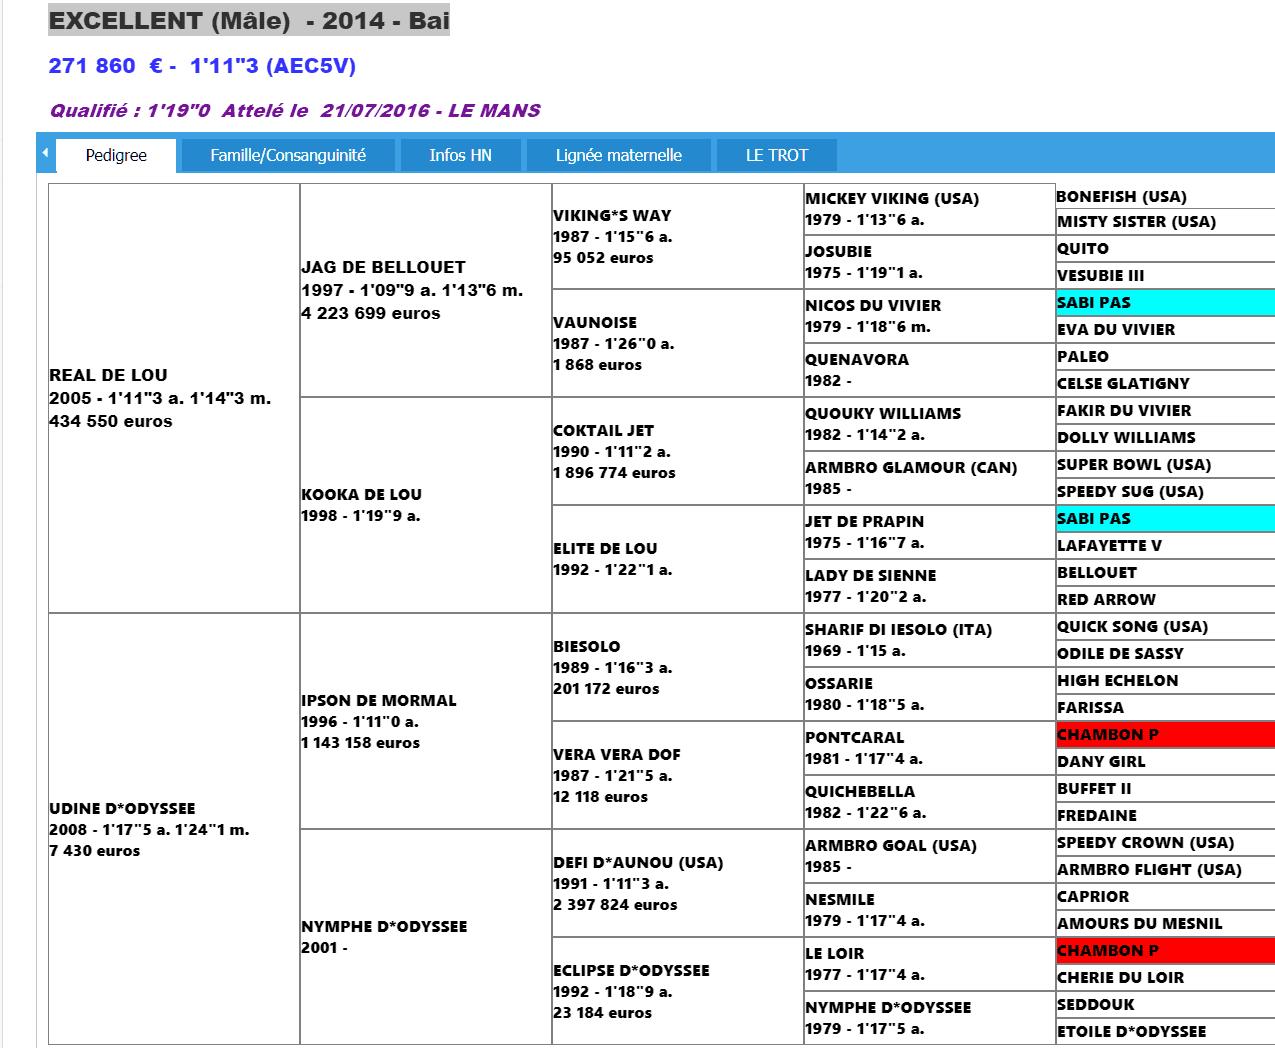 FireShotScreenCapture023-PedigreesetqualificationsTrotteursFranaisl-www_trot-pedigree_net.png